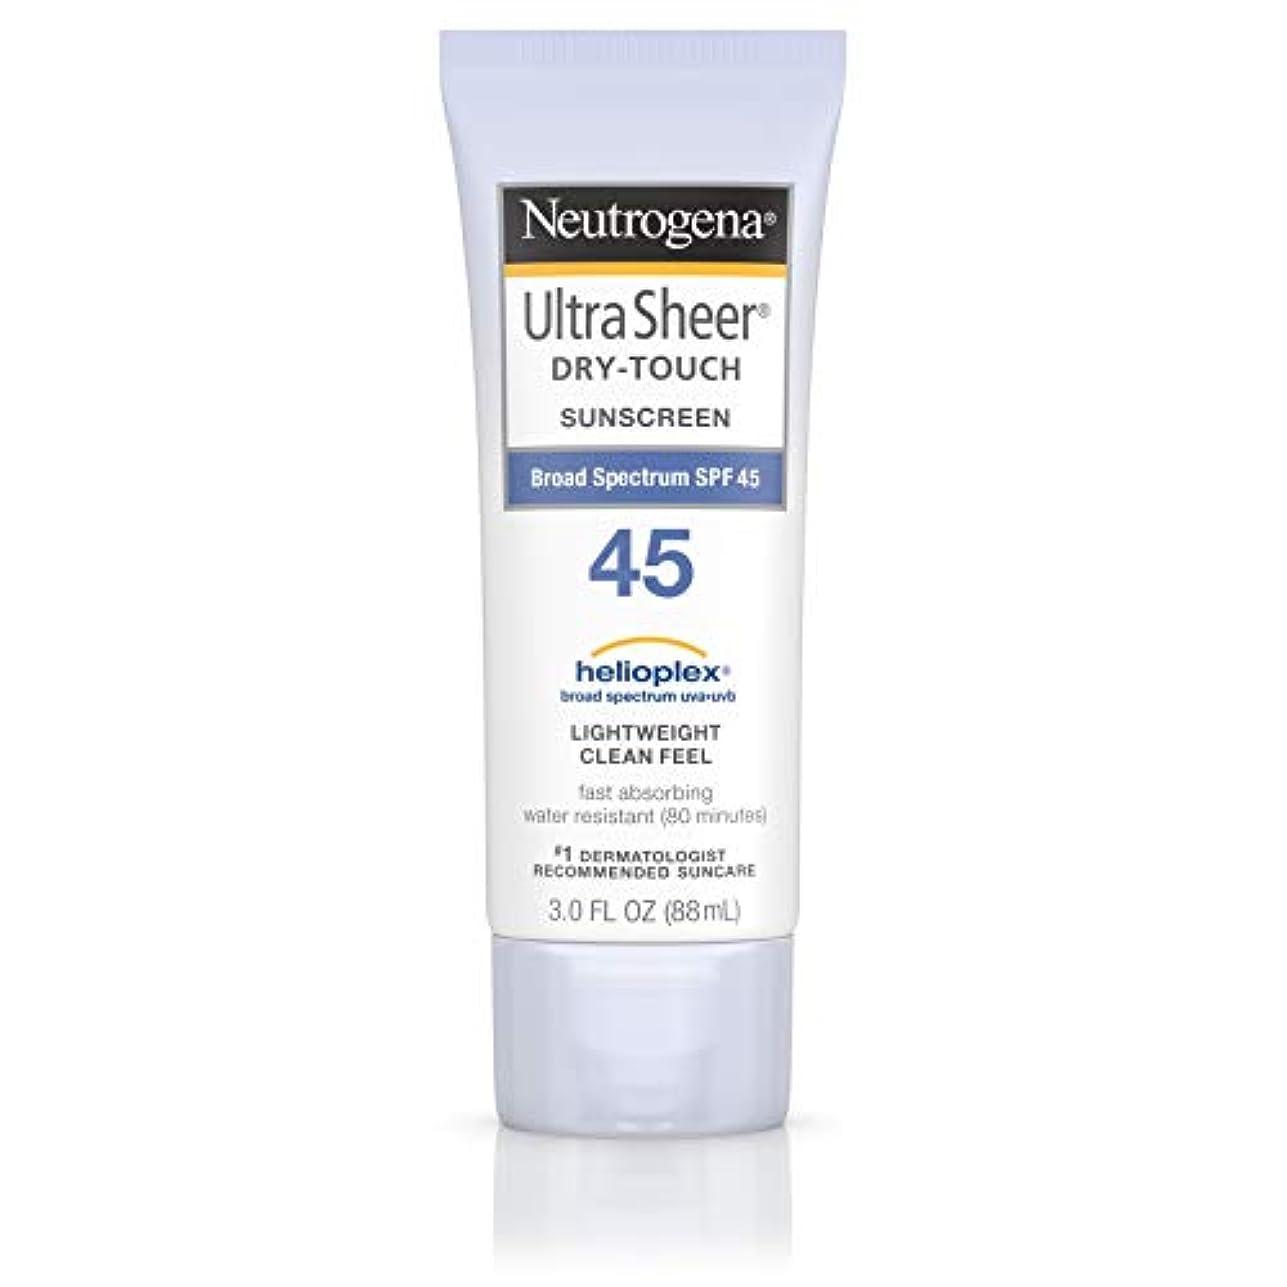 風くそー民間人海外直送品 Neutrogena Neutrogena Ultra Sheer Dry-Touch Sunblock Spf 45【並行輸入品】